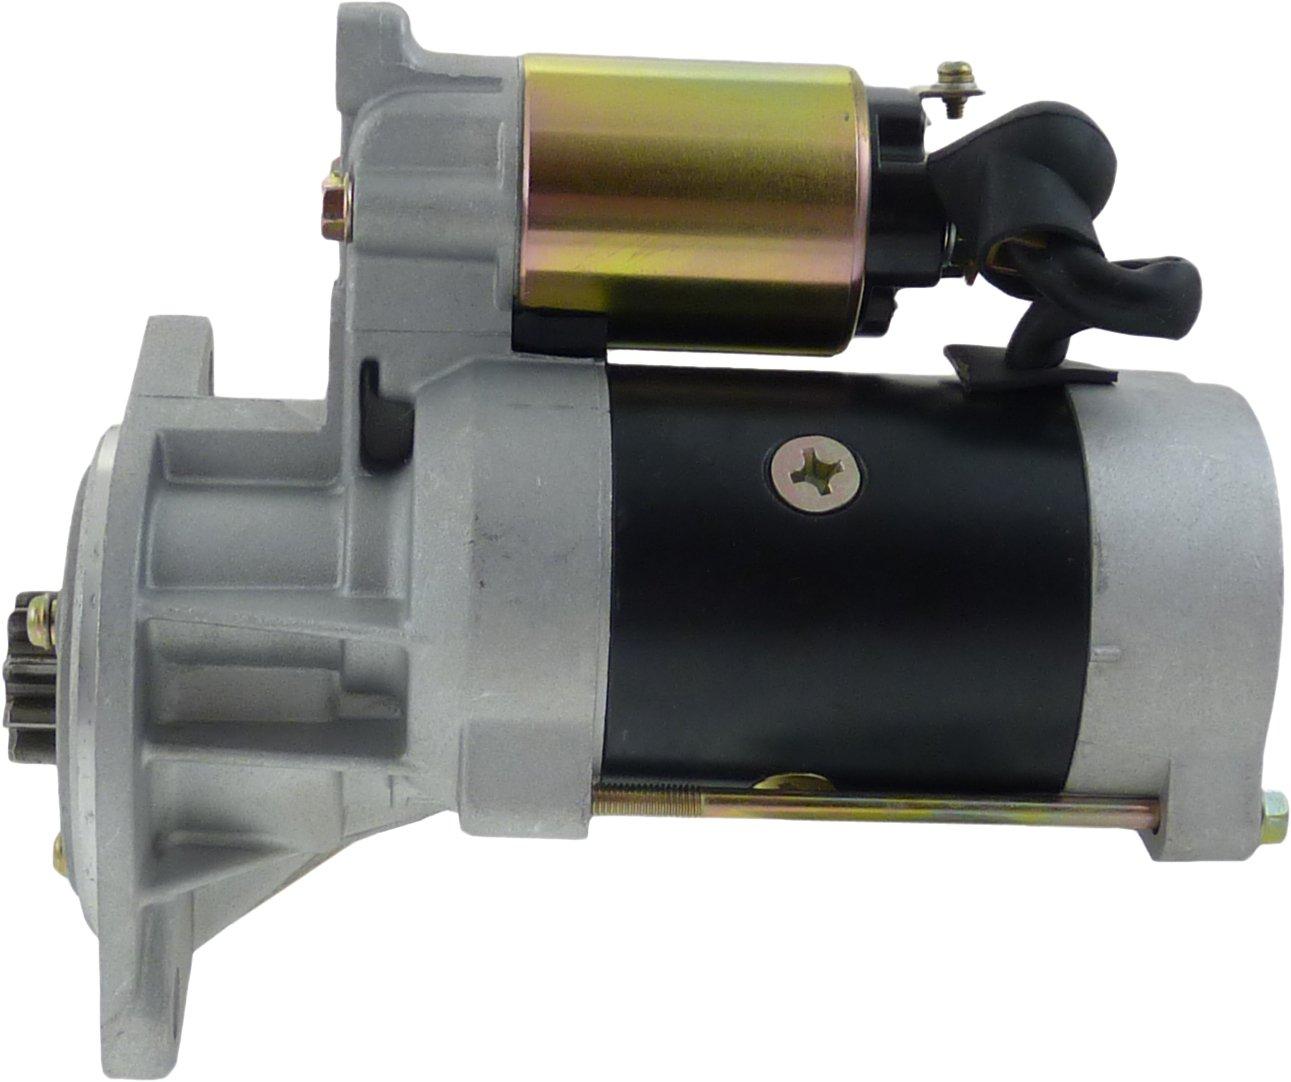 For 745Li 745i 750Li 750i E65 E66 4.4L 4.8L V8 MANN Fuel Filter New